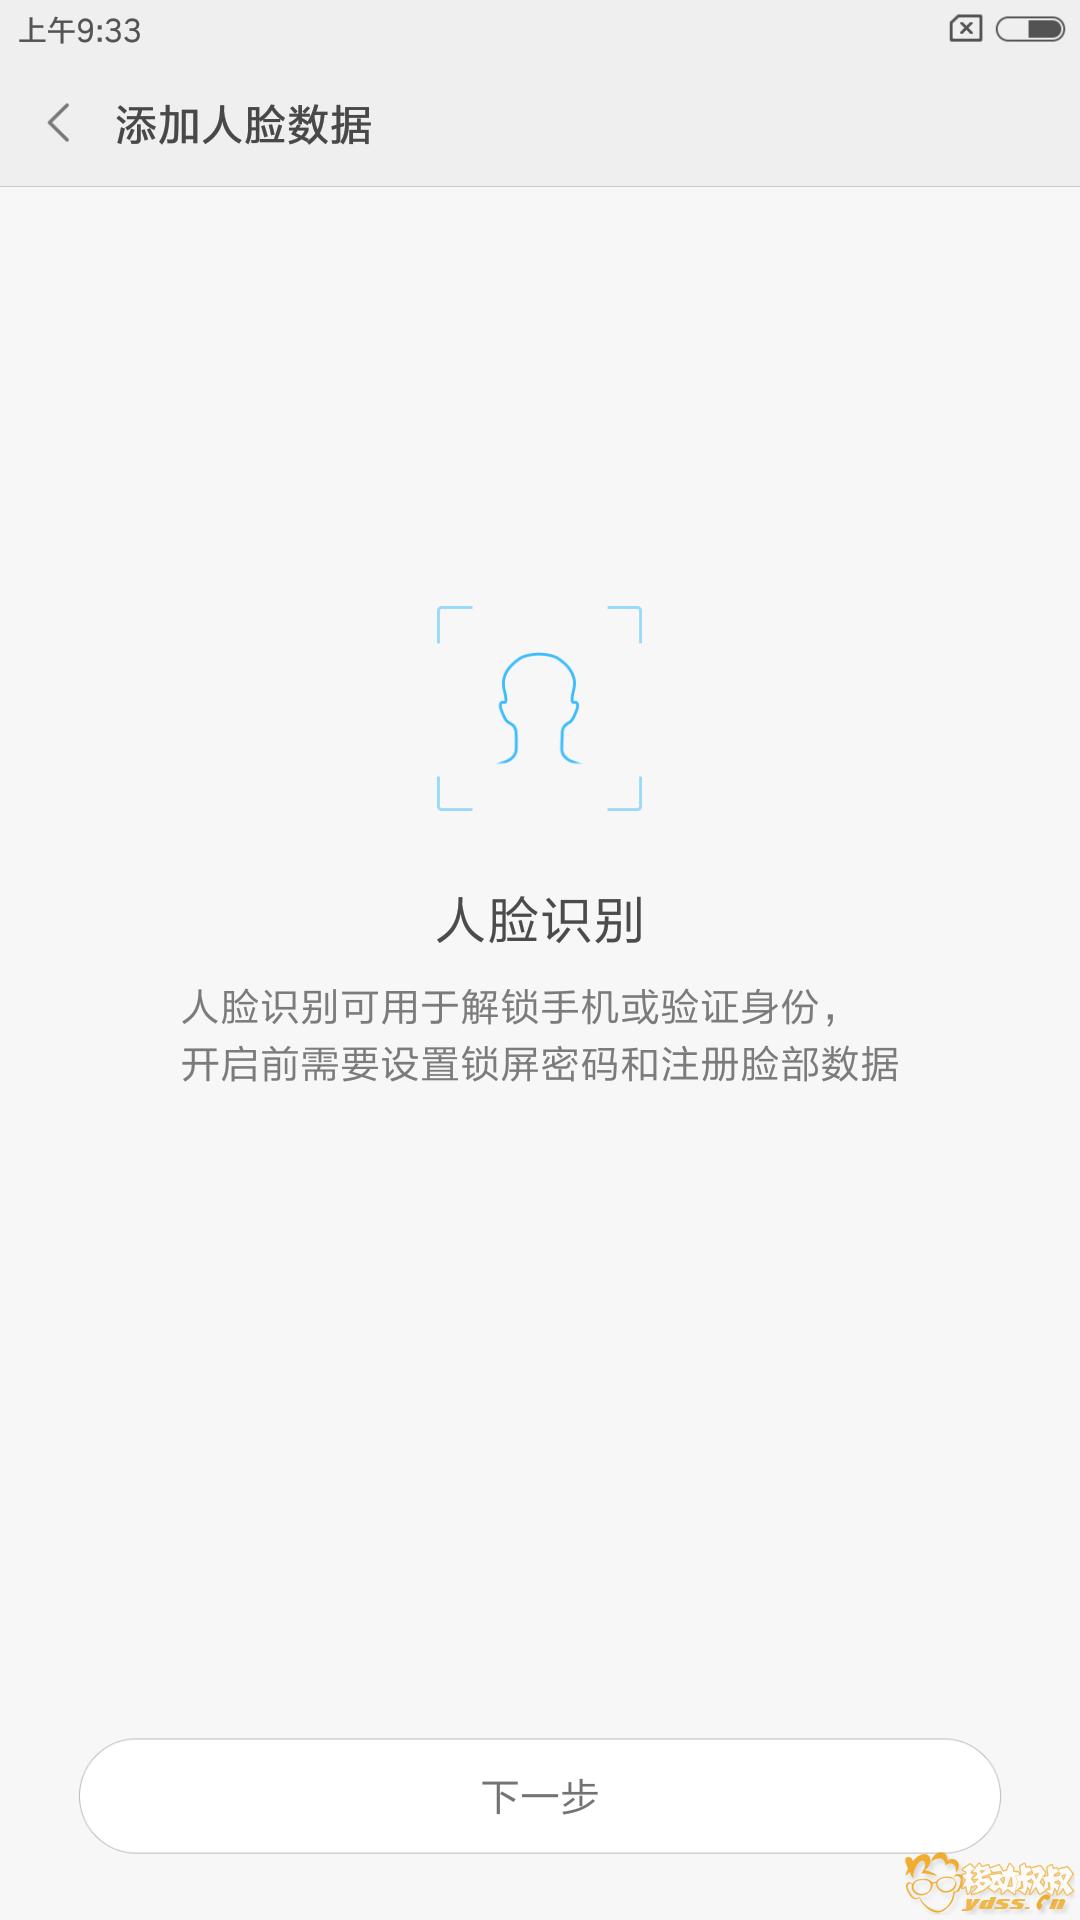 Screenshot_2017-12-10-09-33-30-282_com.android.keyguard.png